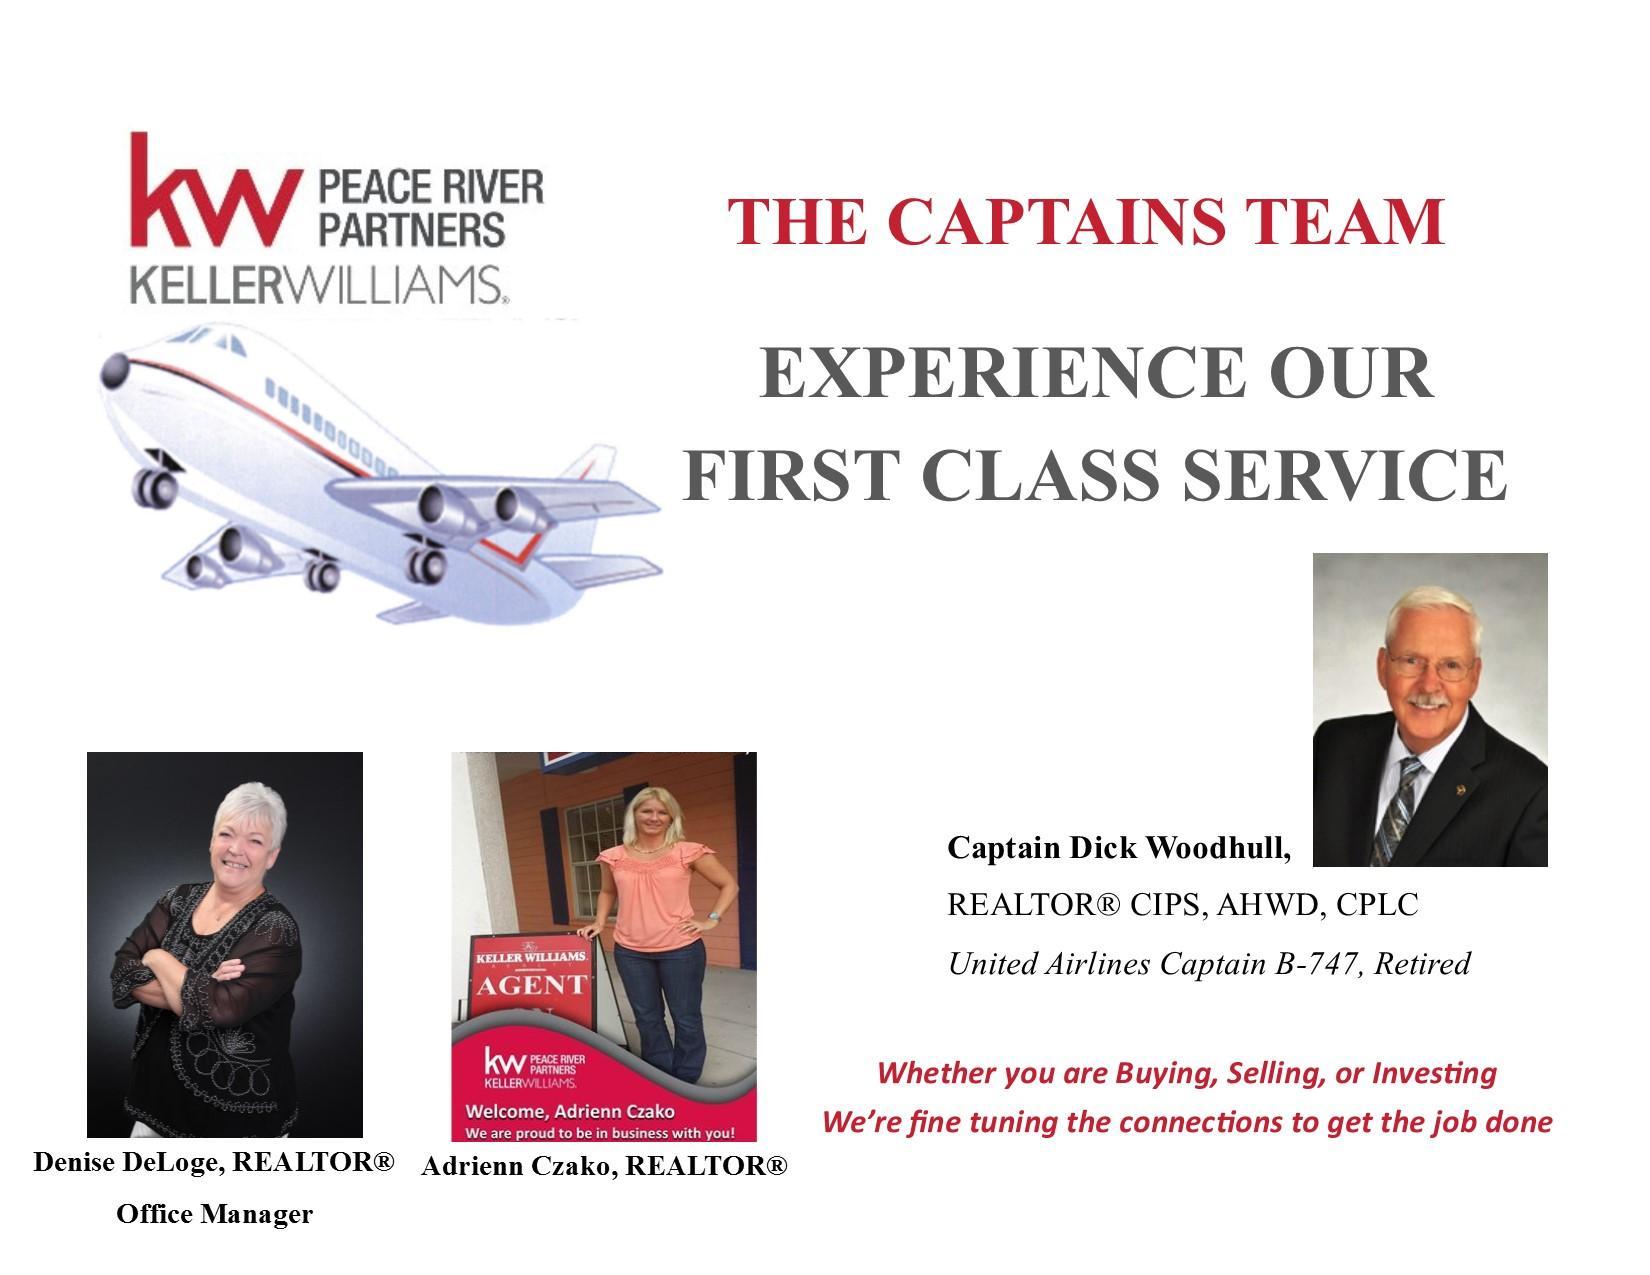 The Captain's Team - Keller Williams Realty